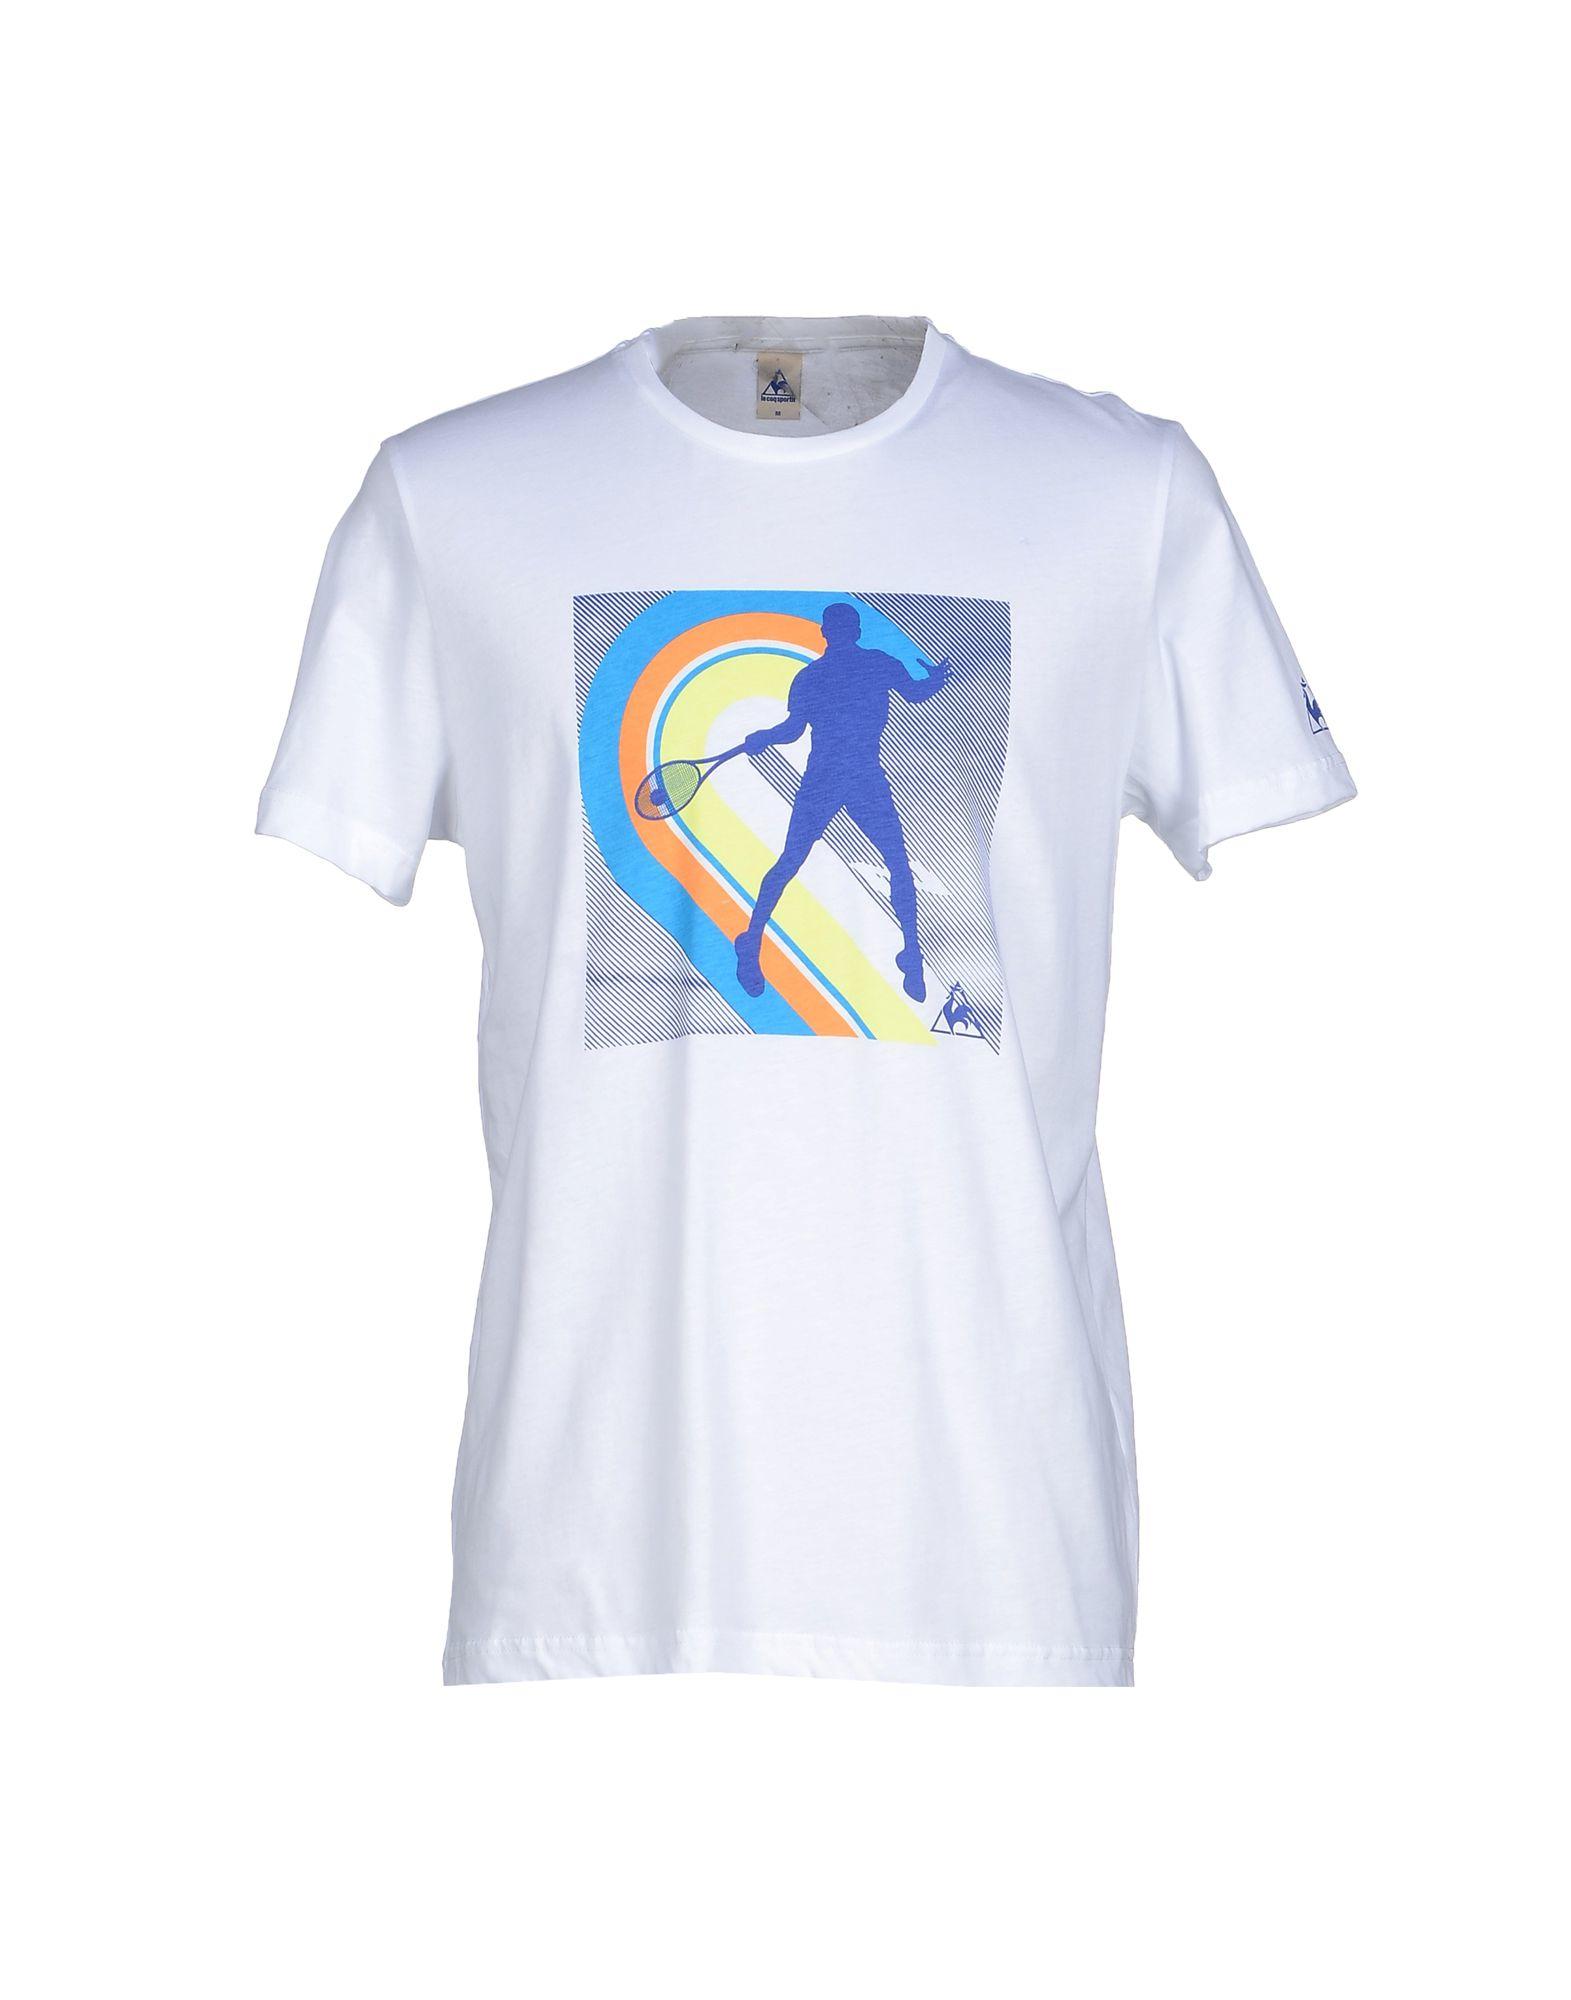 le coq sportif shirt - photo #17